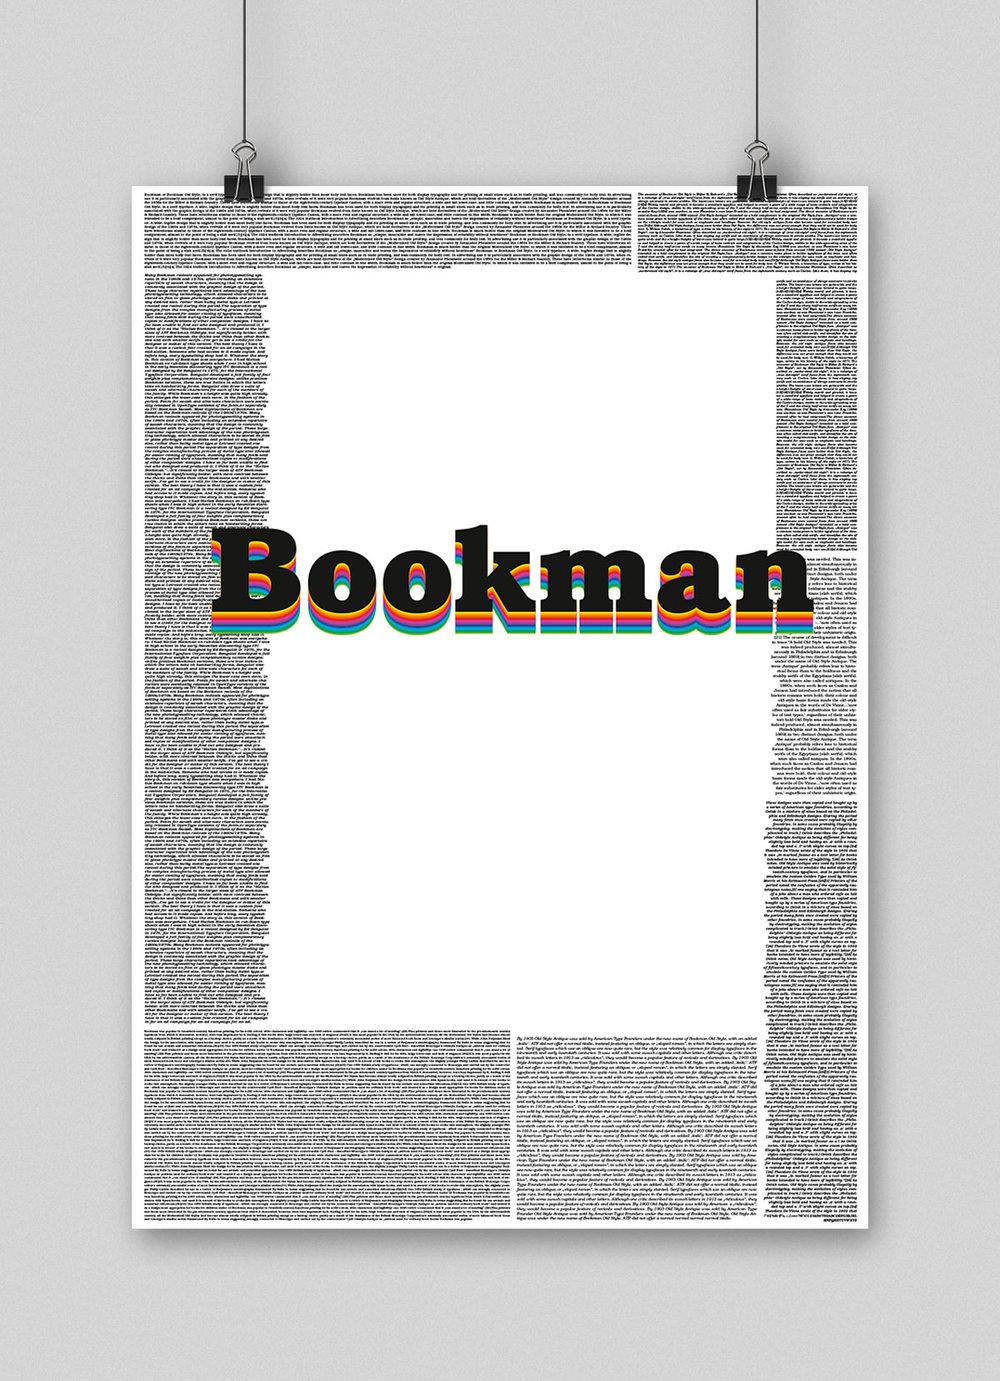 Bookman.jpg